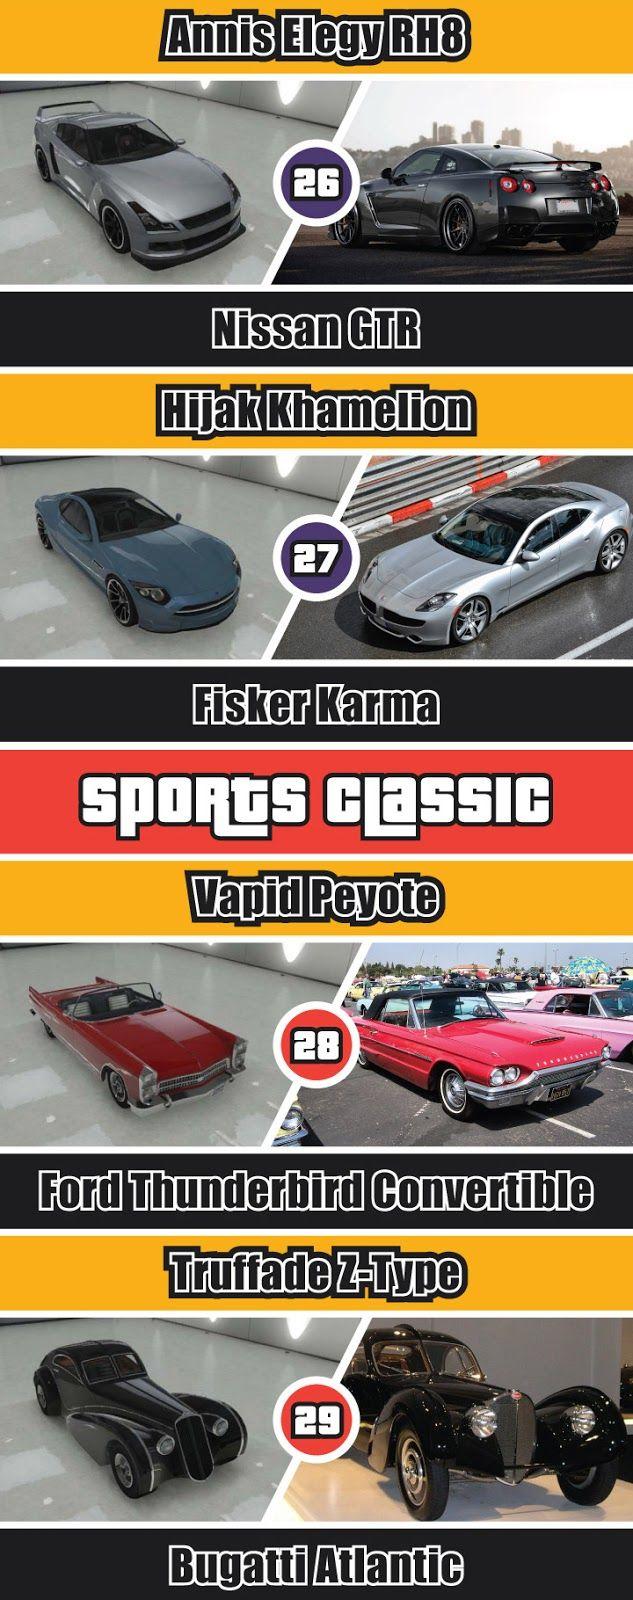 1229815a51273a29ca667788b23e08e4 - How To Get Real Life Cars On Gta 5 Ps4